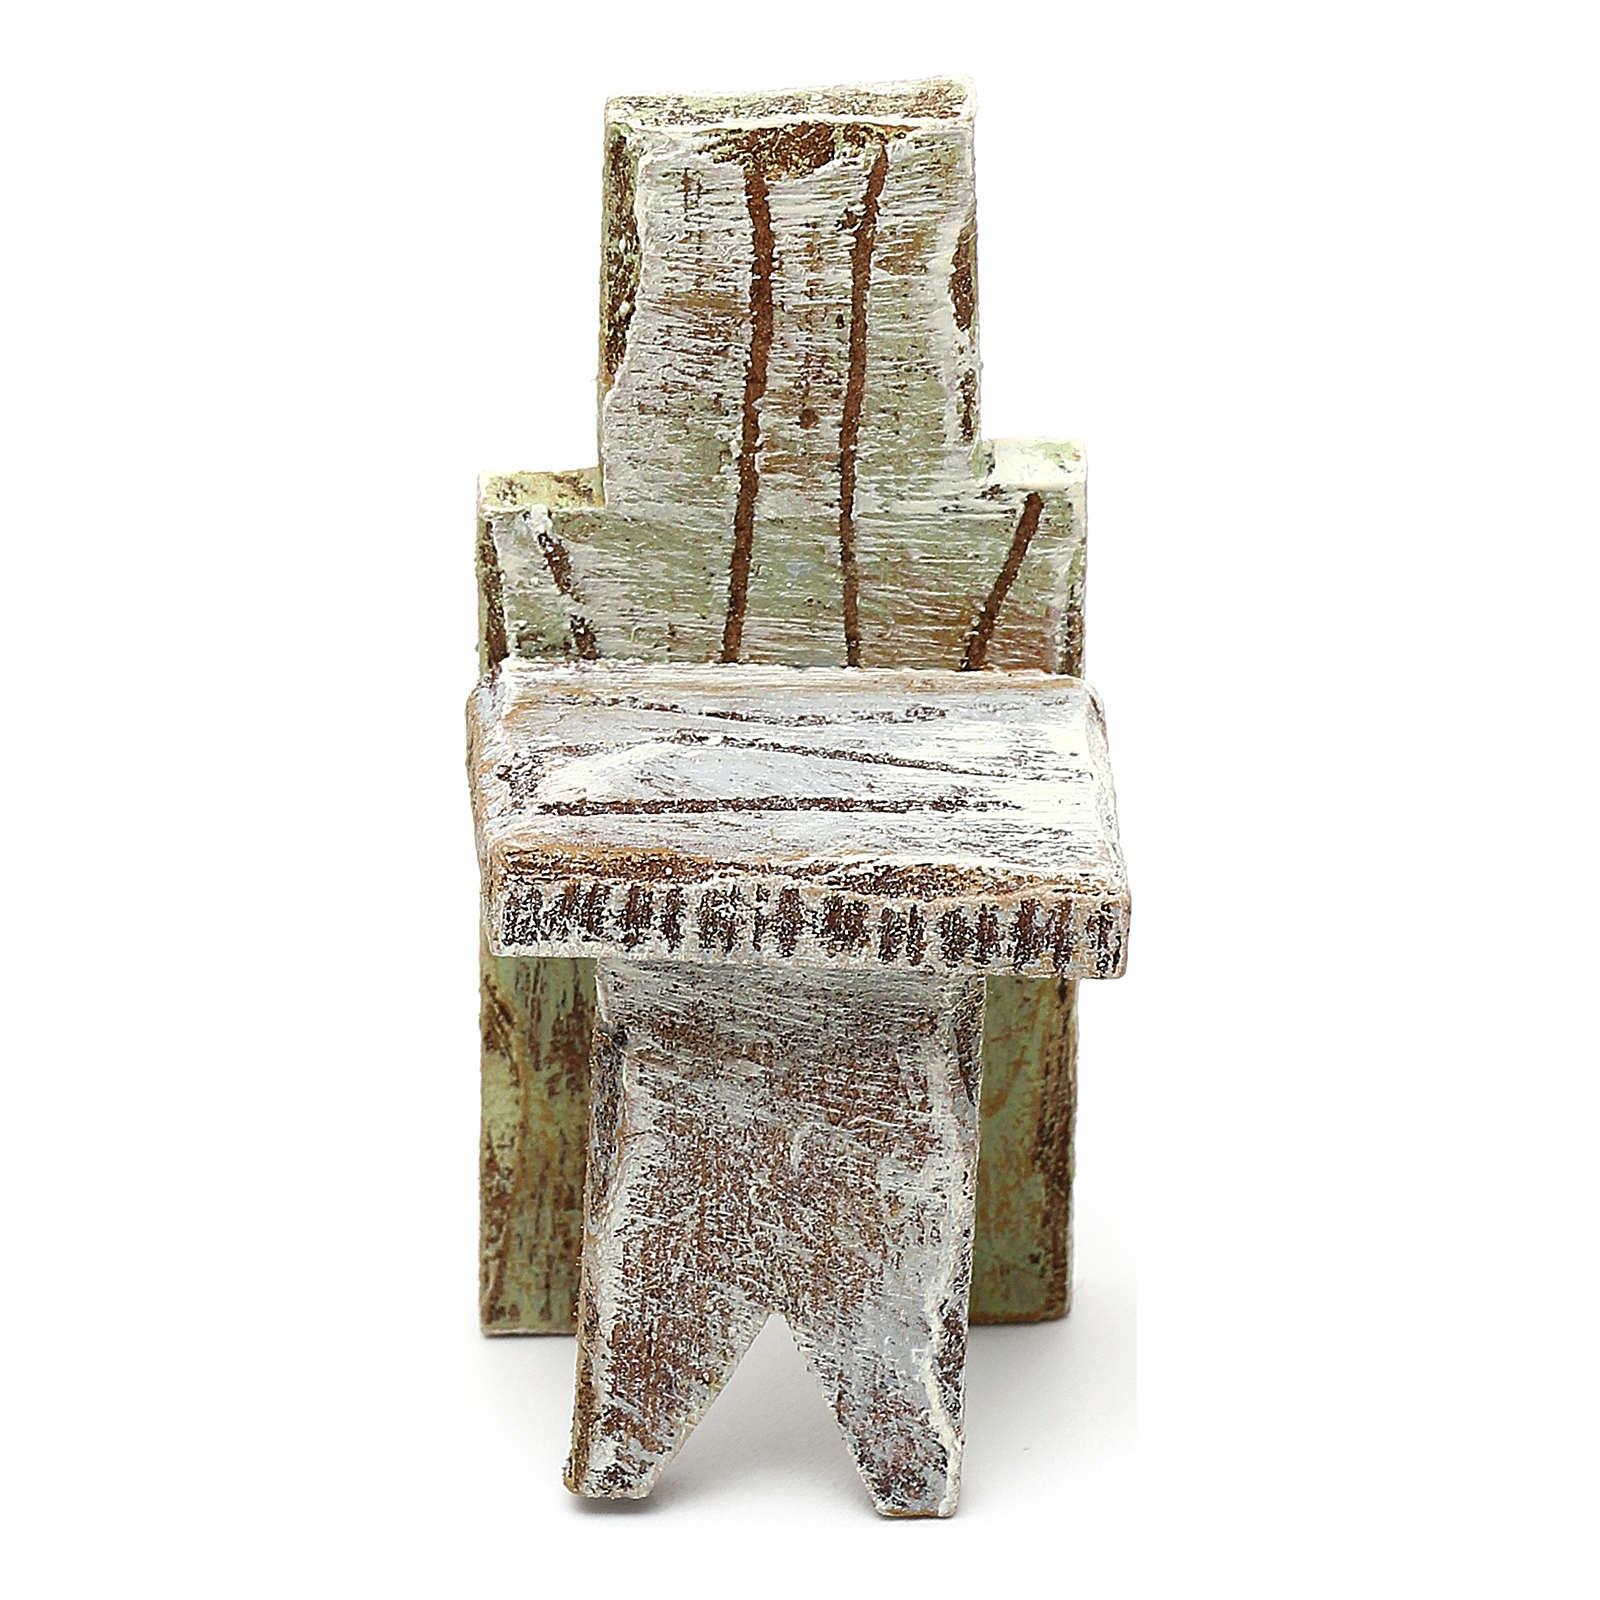 Silla simple belén 10 cm accesorio 5x3x3 cm 4